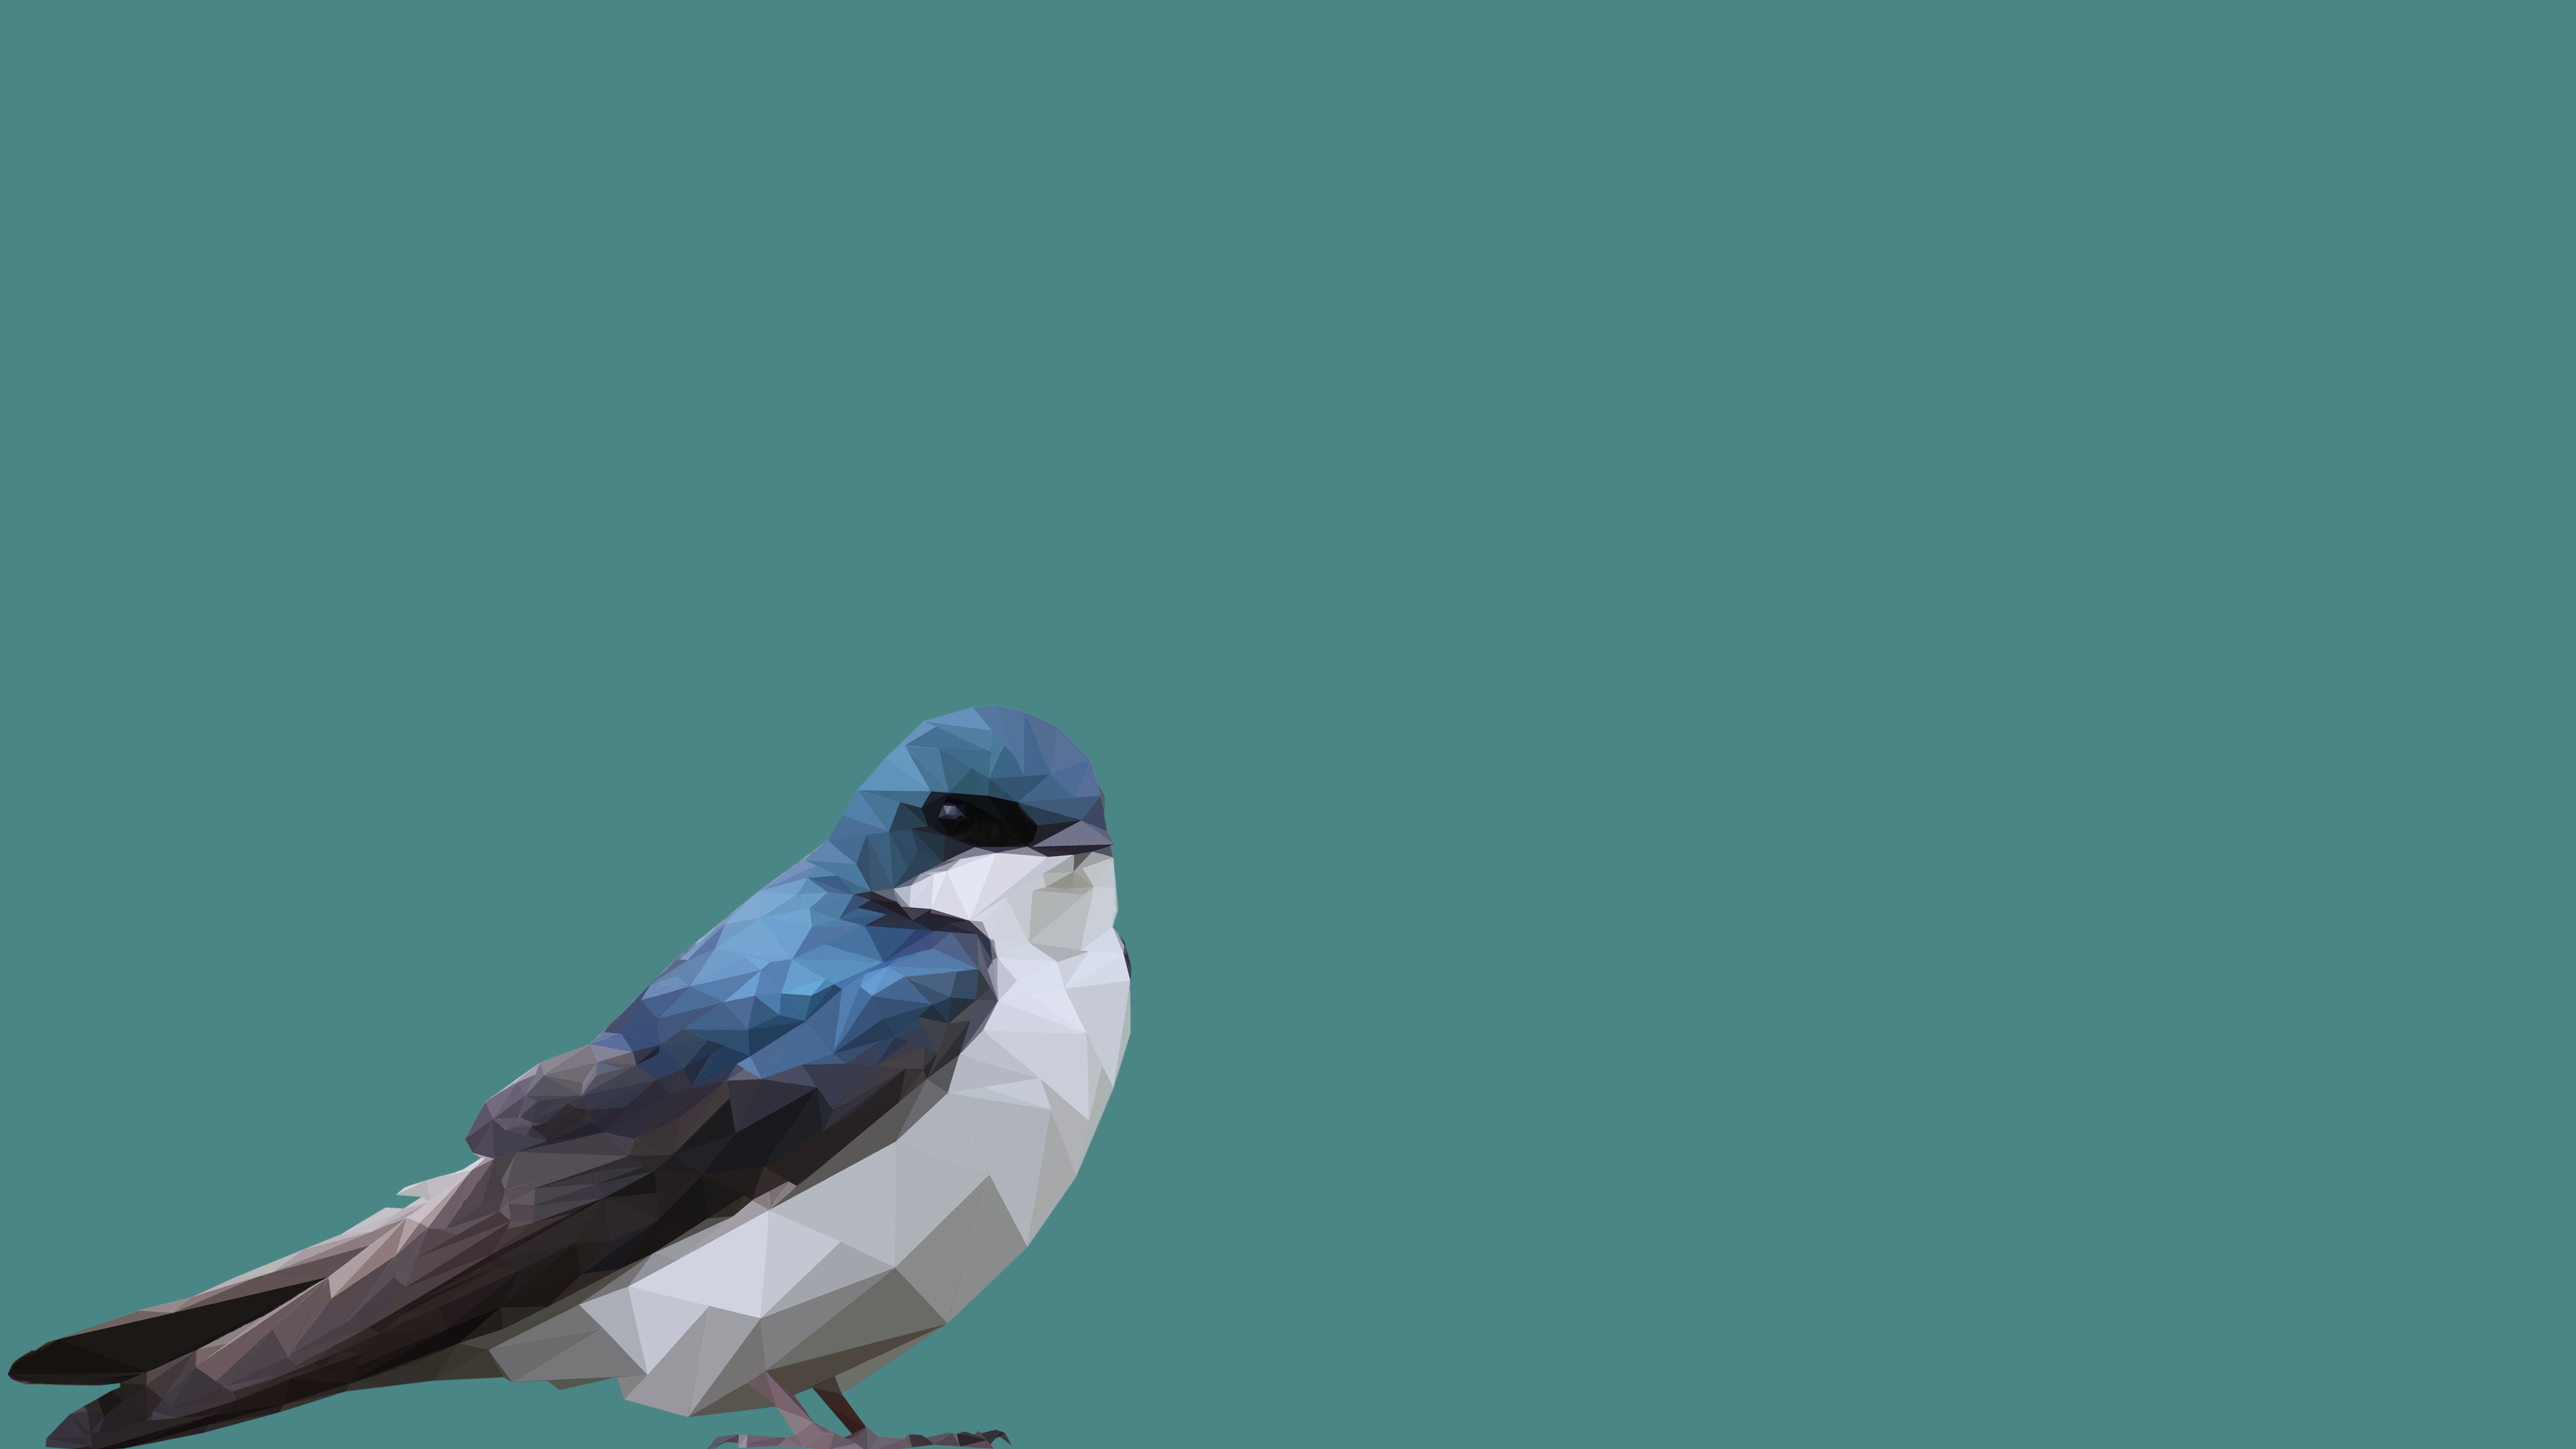 Best Wallpaper Bird Minimalist - low_poly_blue_bird_by_photosoups-db8kbsz  Image_857926.png